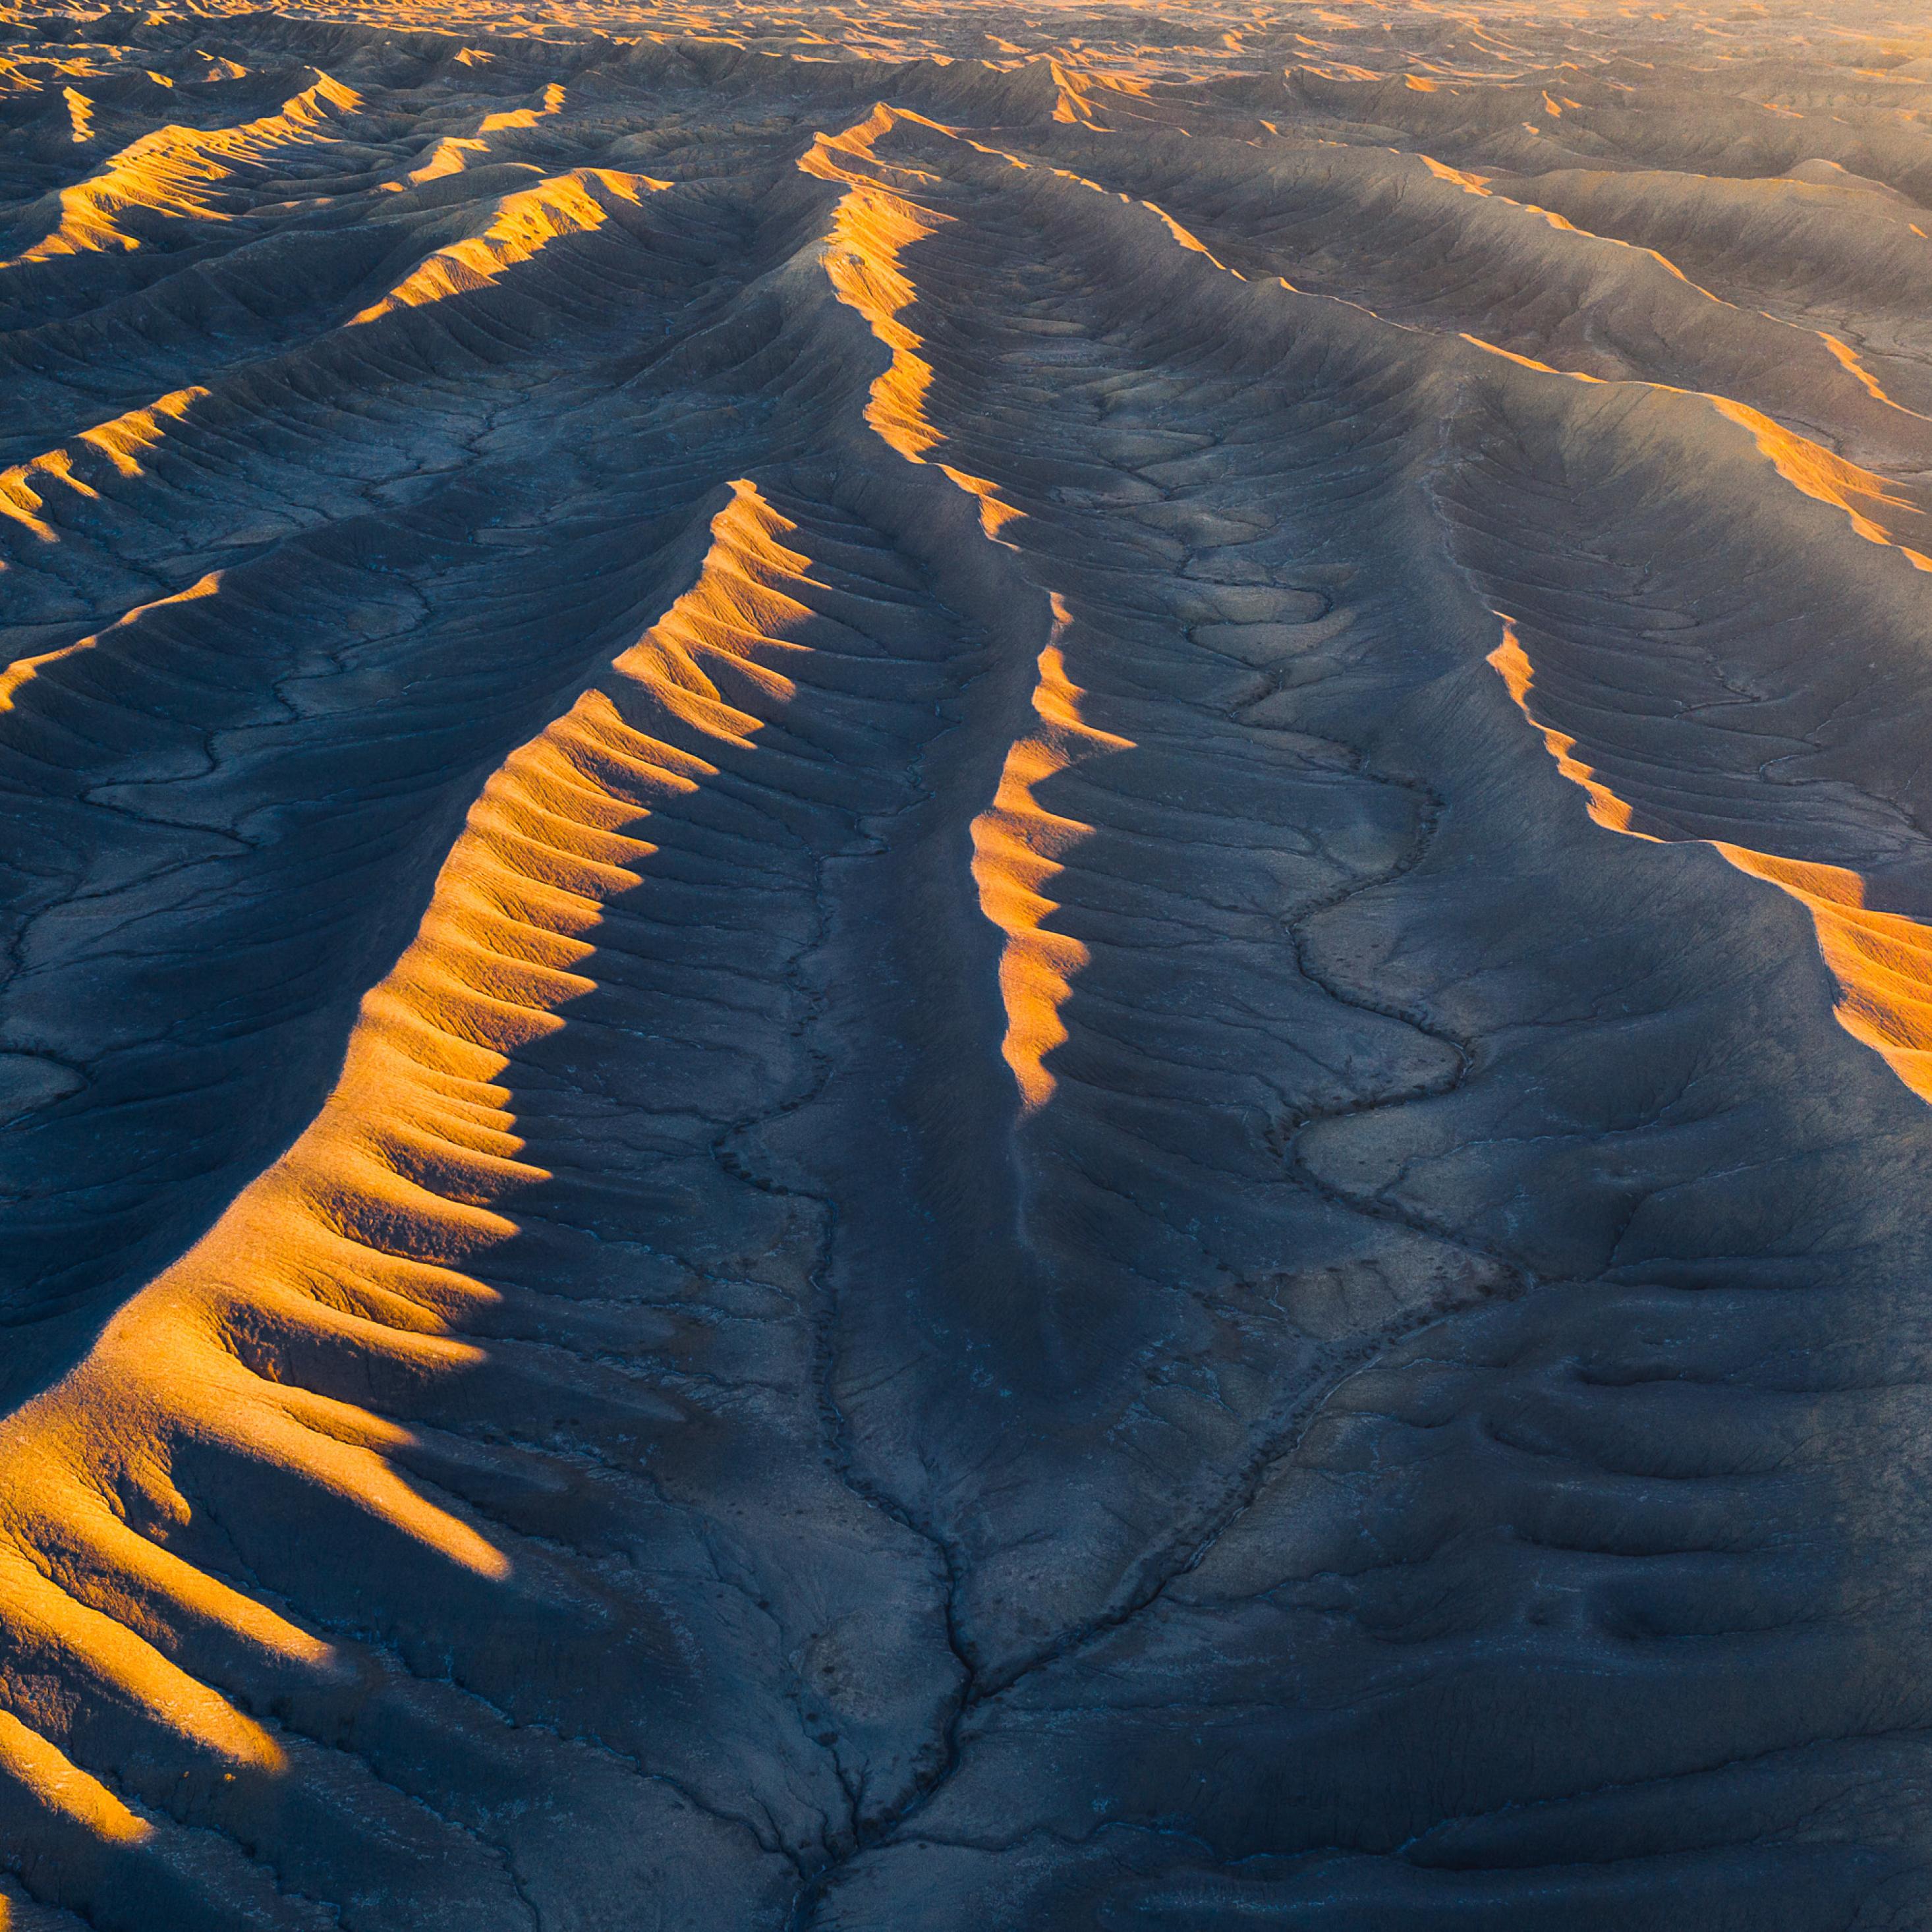 Aerial View From Utah Desert Wallpaper in 2932x2932 Resolution